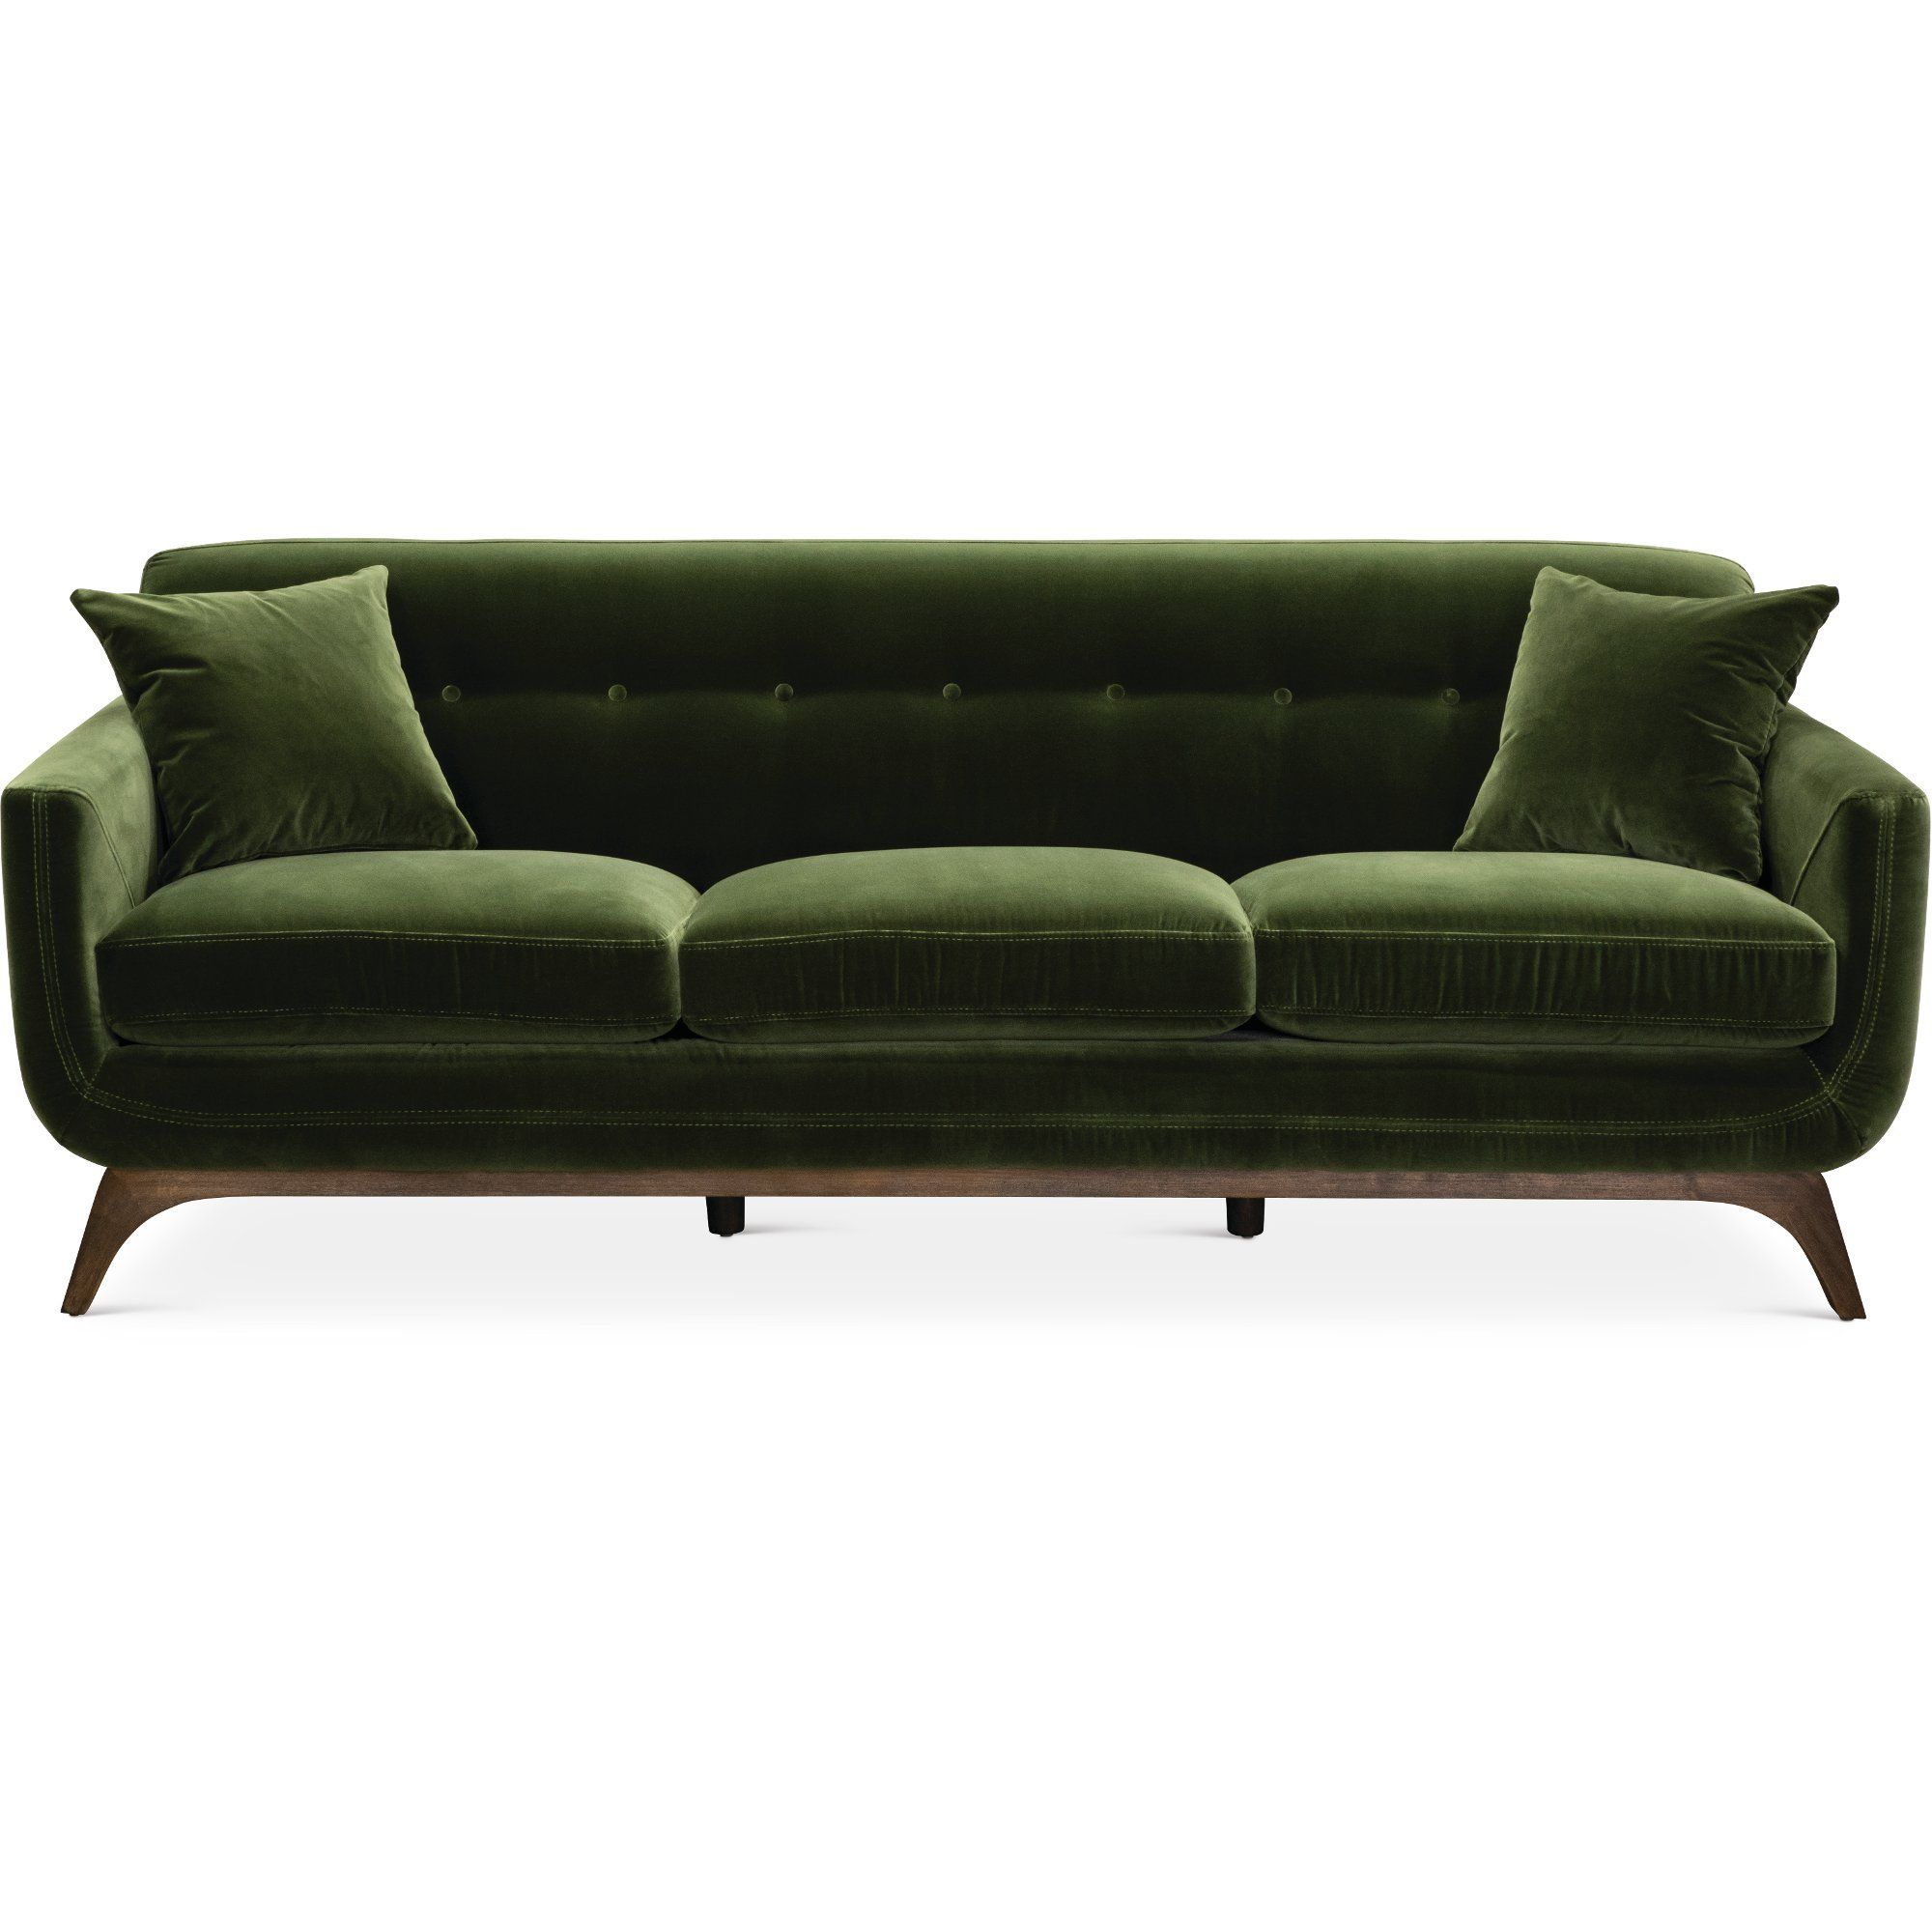 Mid Century Modern Olive Green Sofa Falkirk Green Sofa Mid Century Modern Furniture Cheap Living Room Furniture